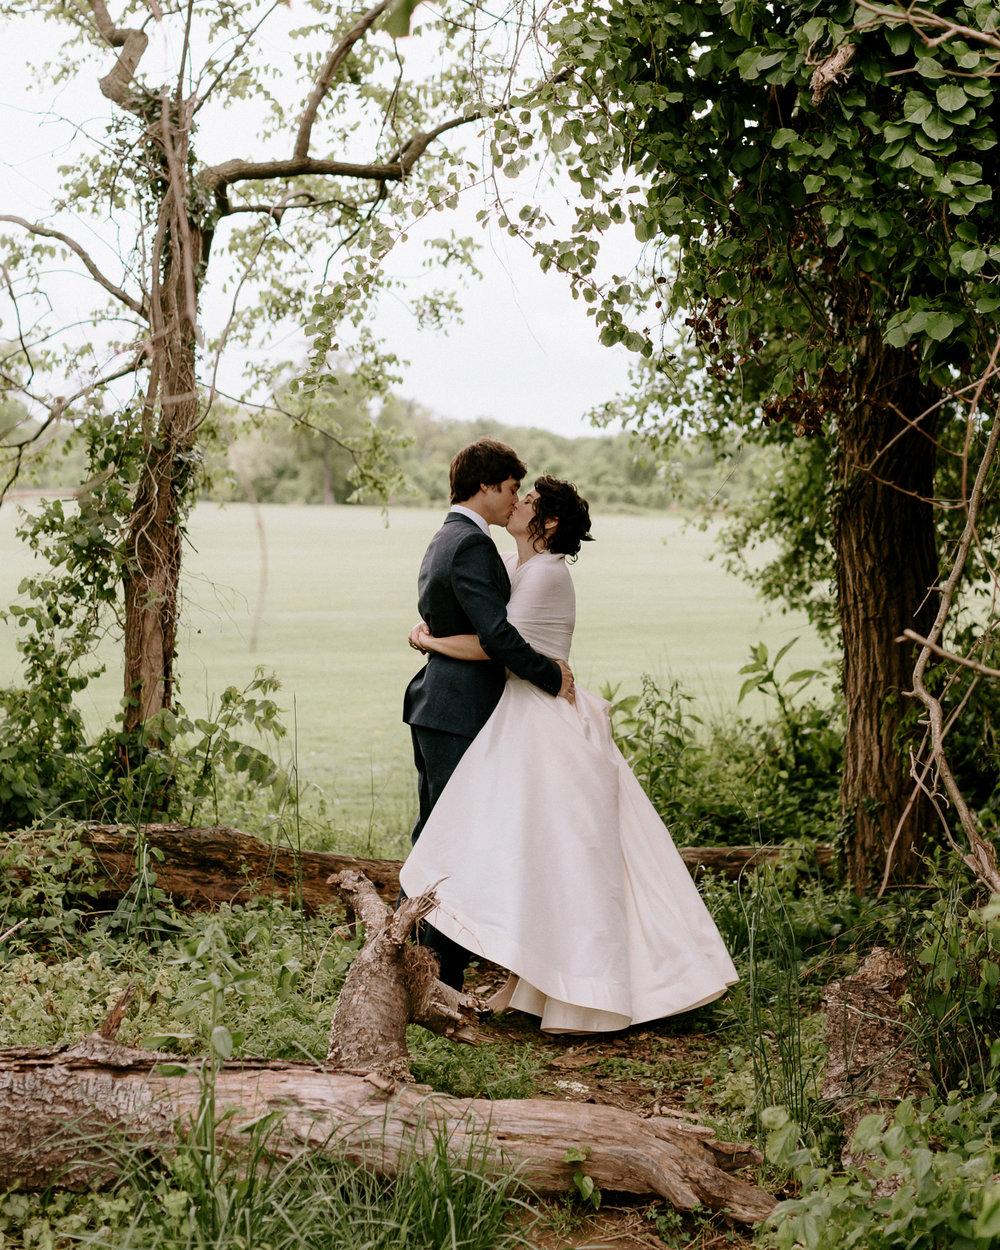 Annapolis-Maryland-Backyard-Wedding-Photographer-Hannah-Houston-65.jpg